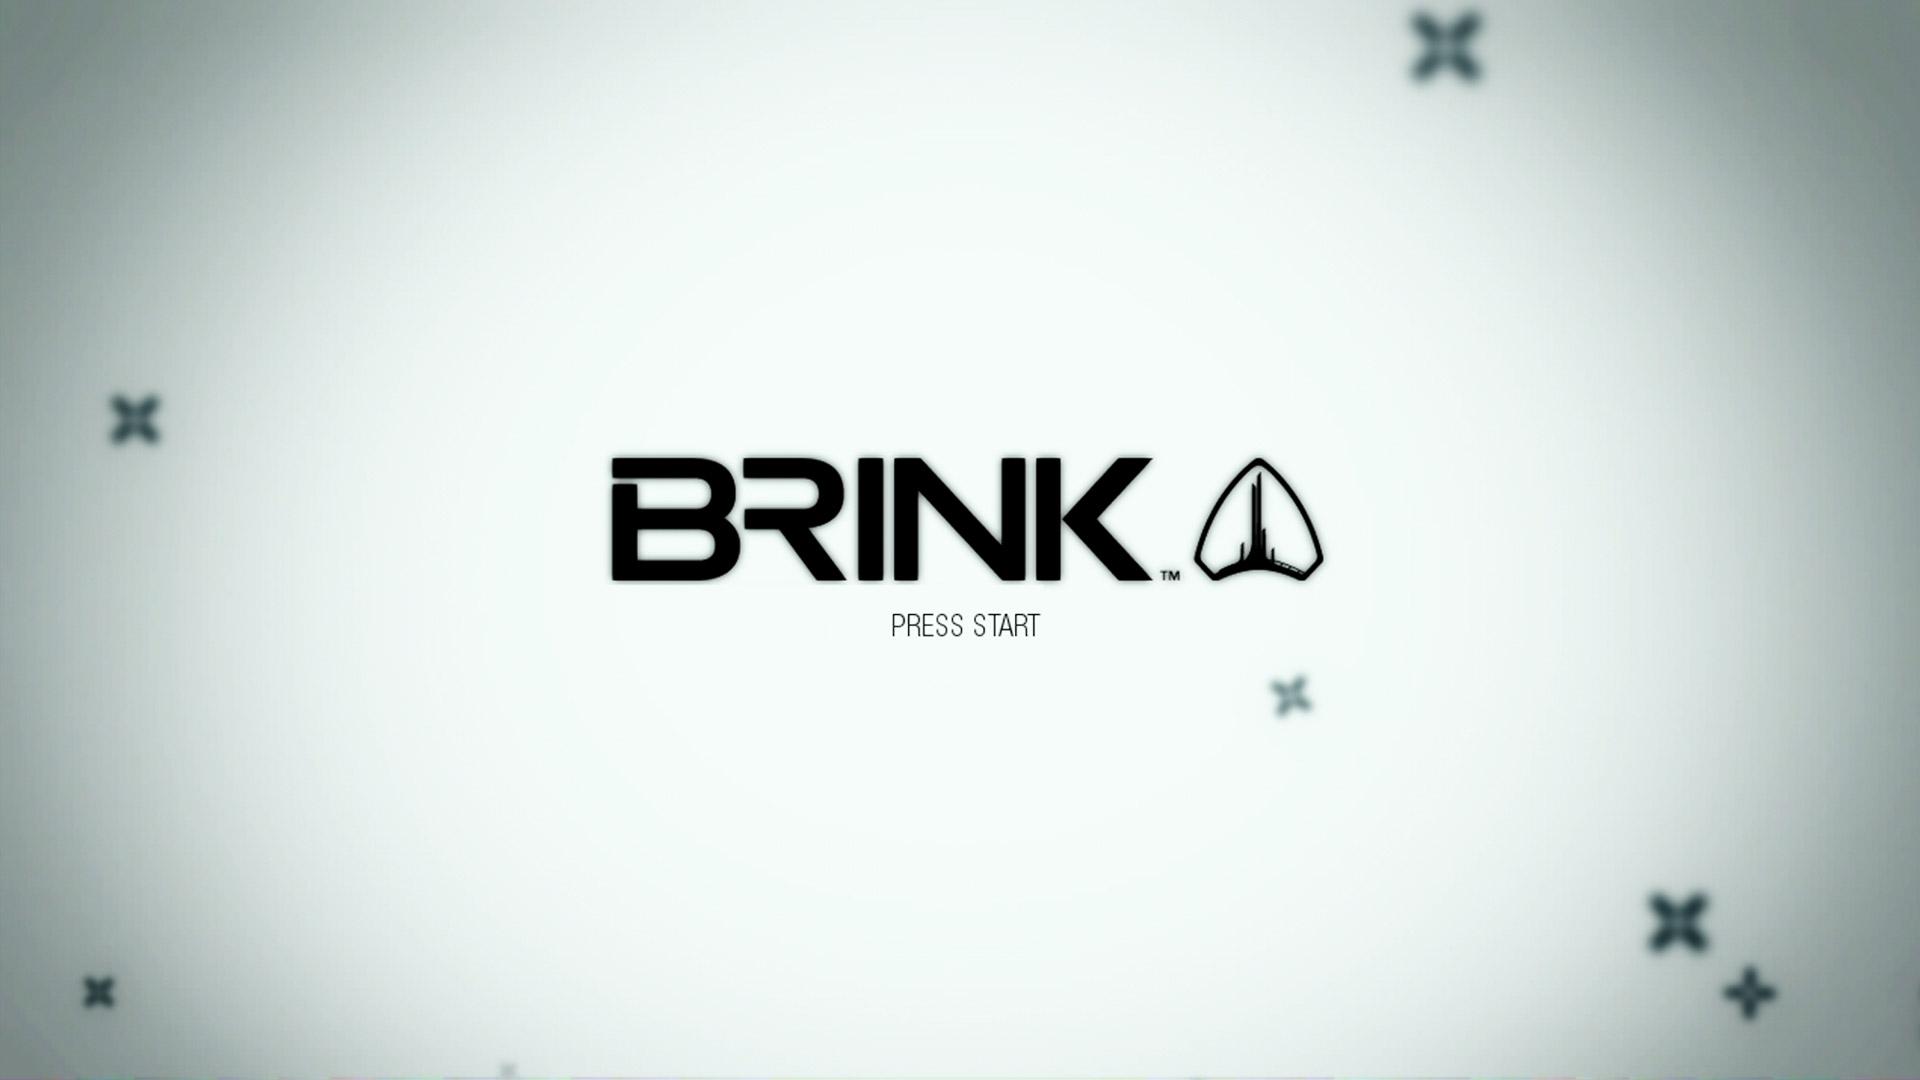 Brink wallpaper 1